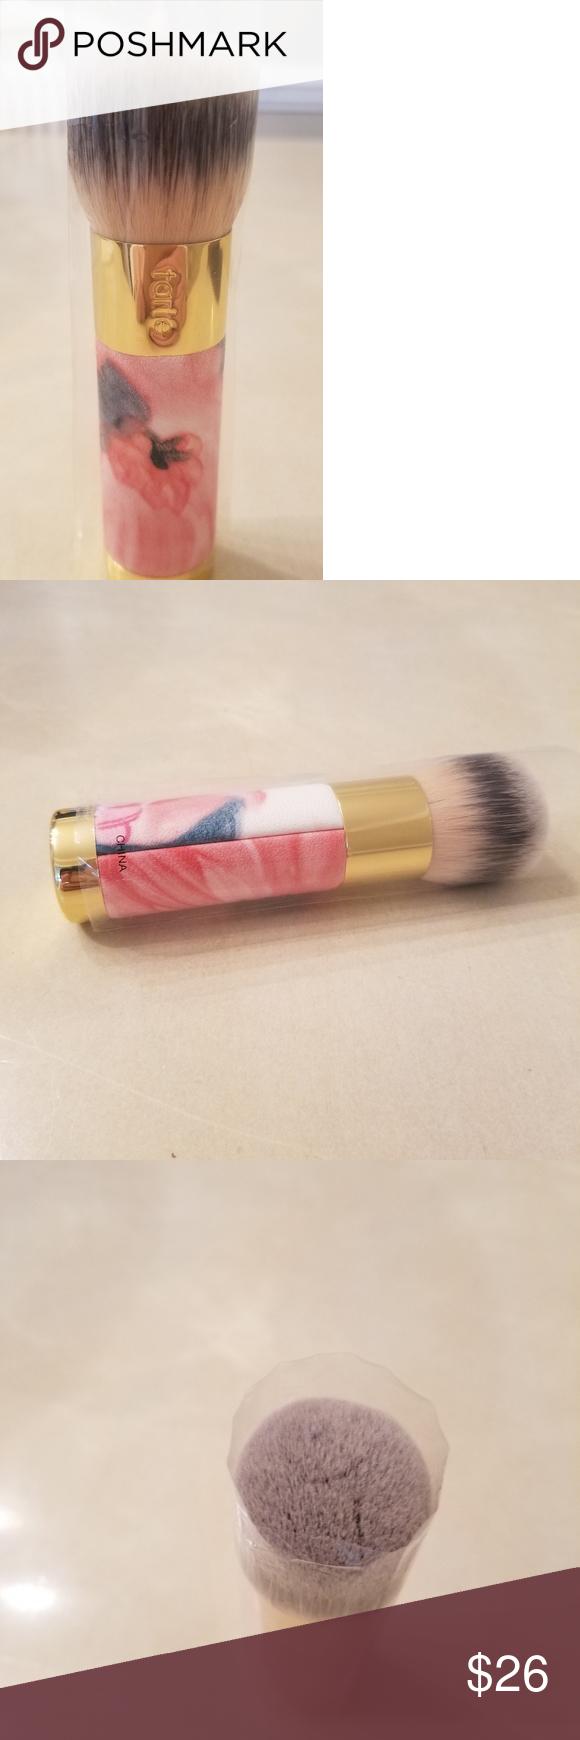 Brush Tarte makeup brushes, Brush, Makeup tools brushes